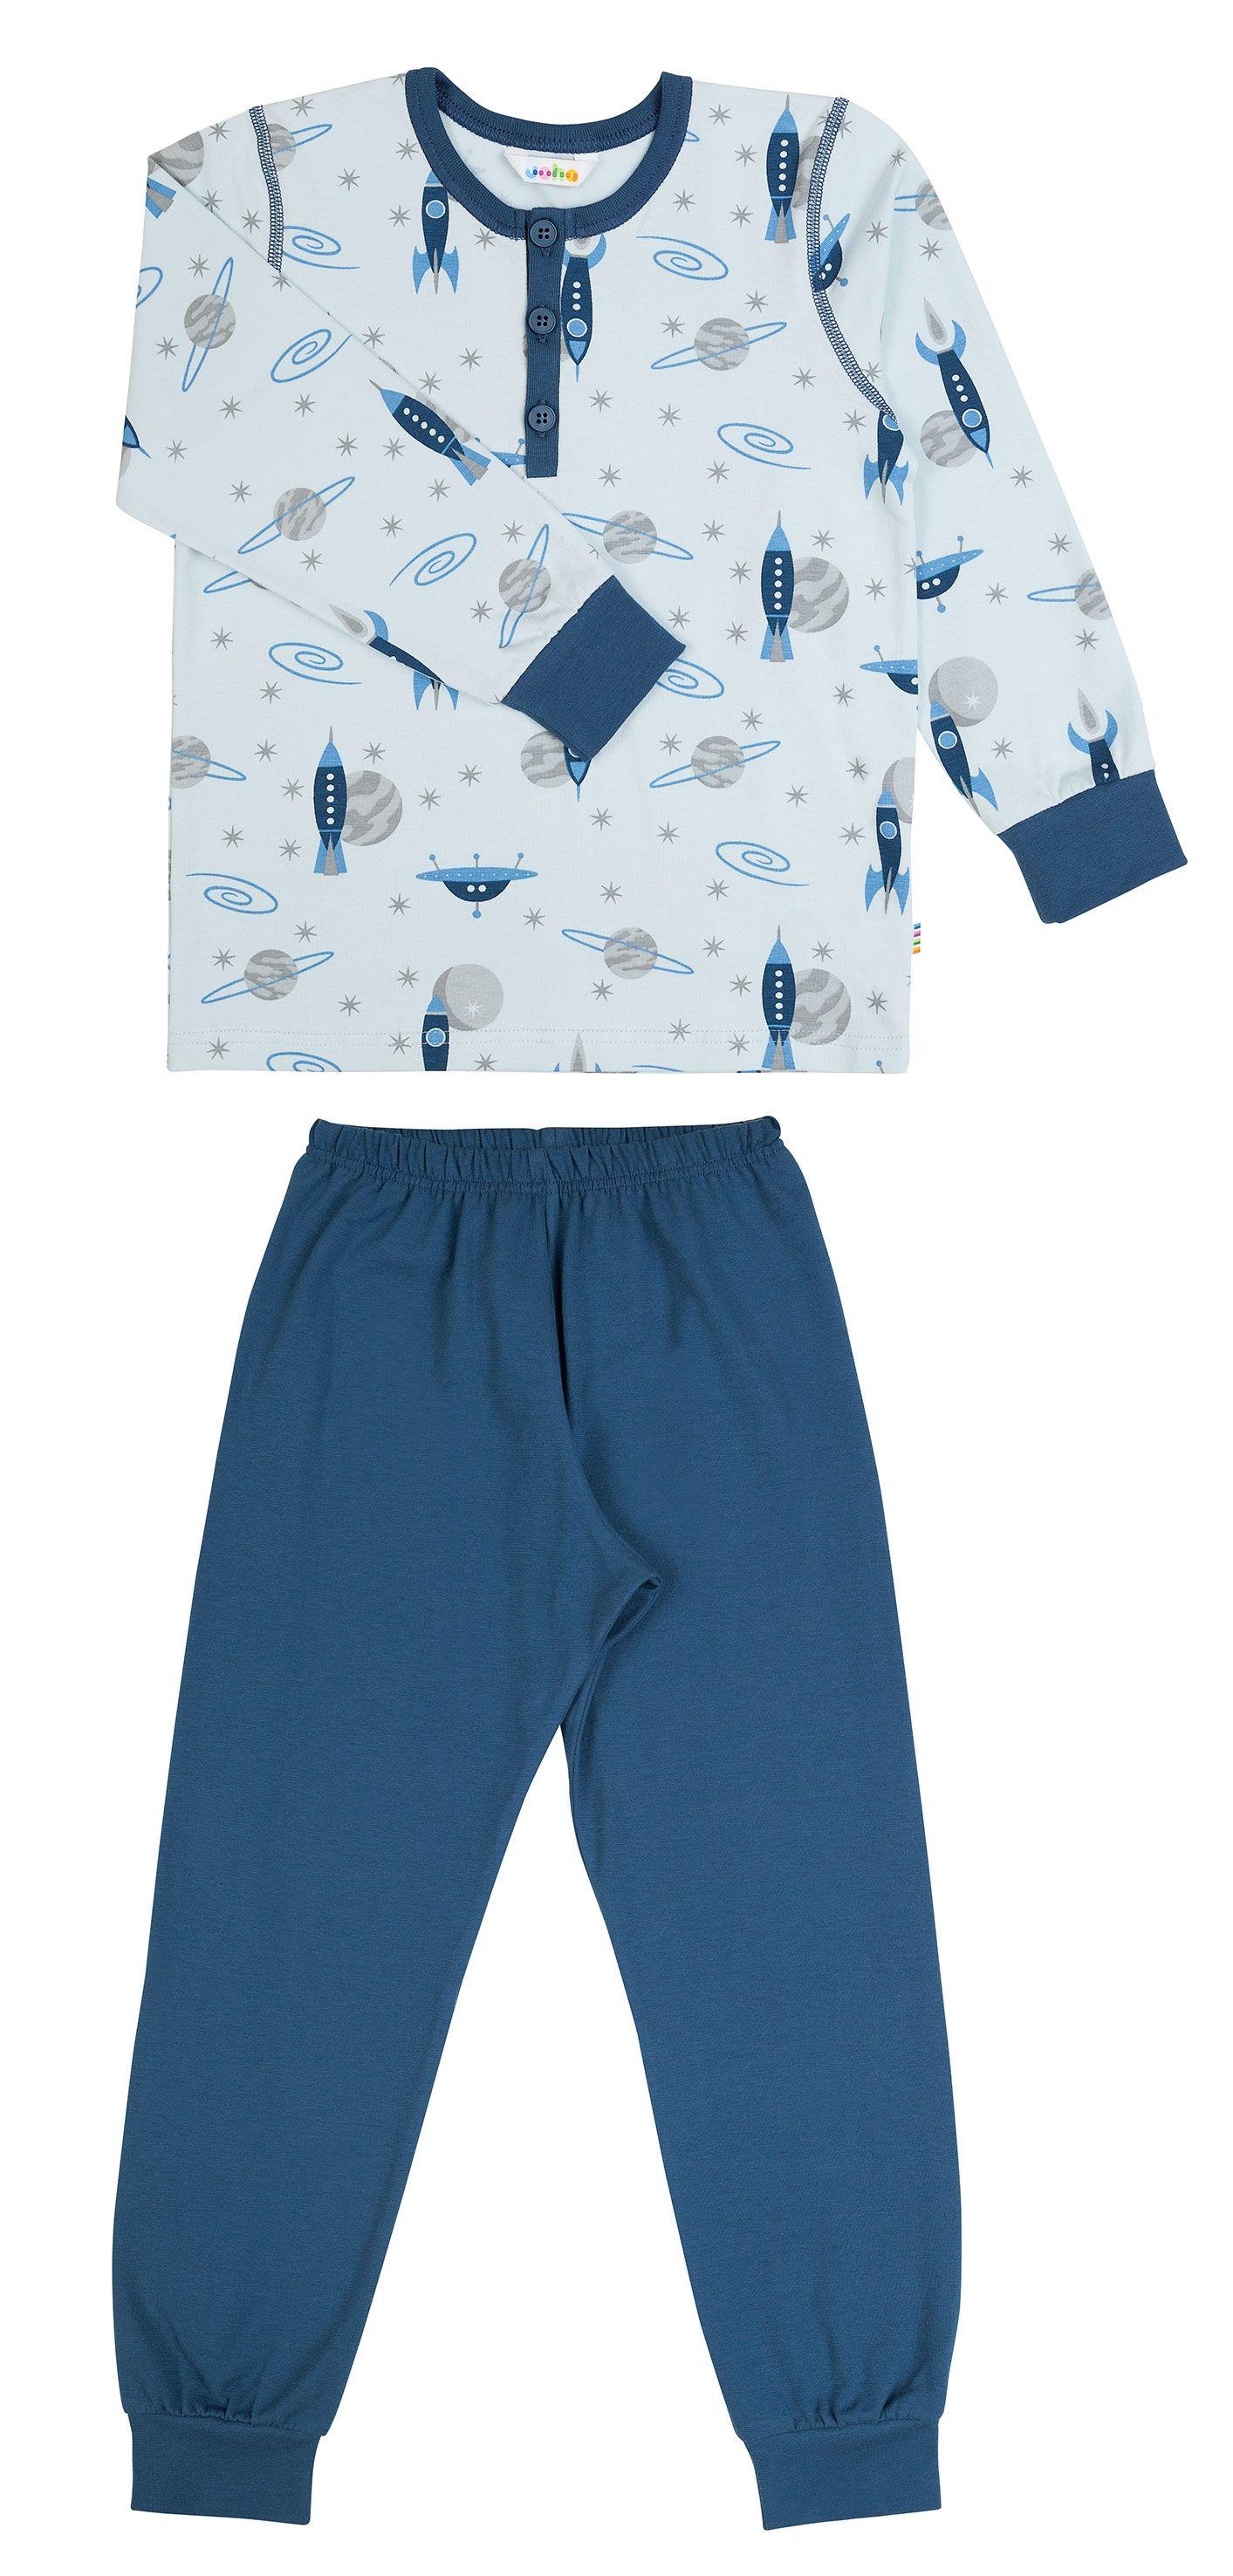 Image of   Pyjamas fra Joha - Økologisk - Spaceride